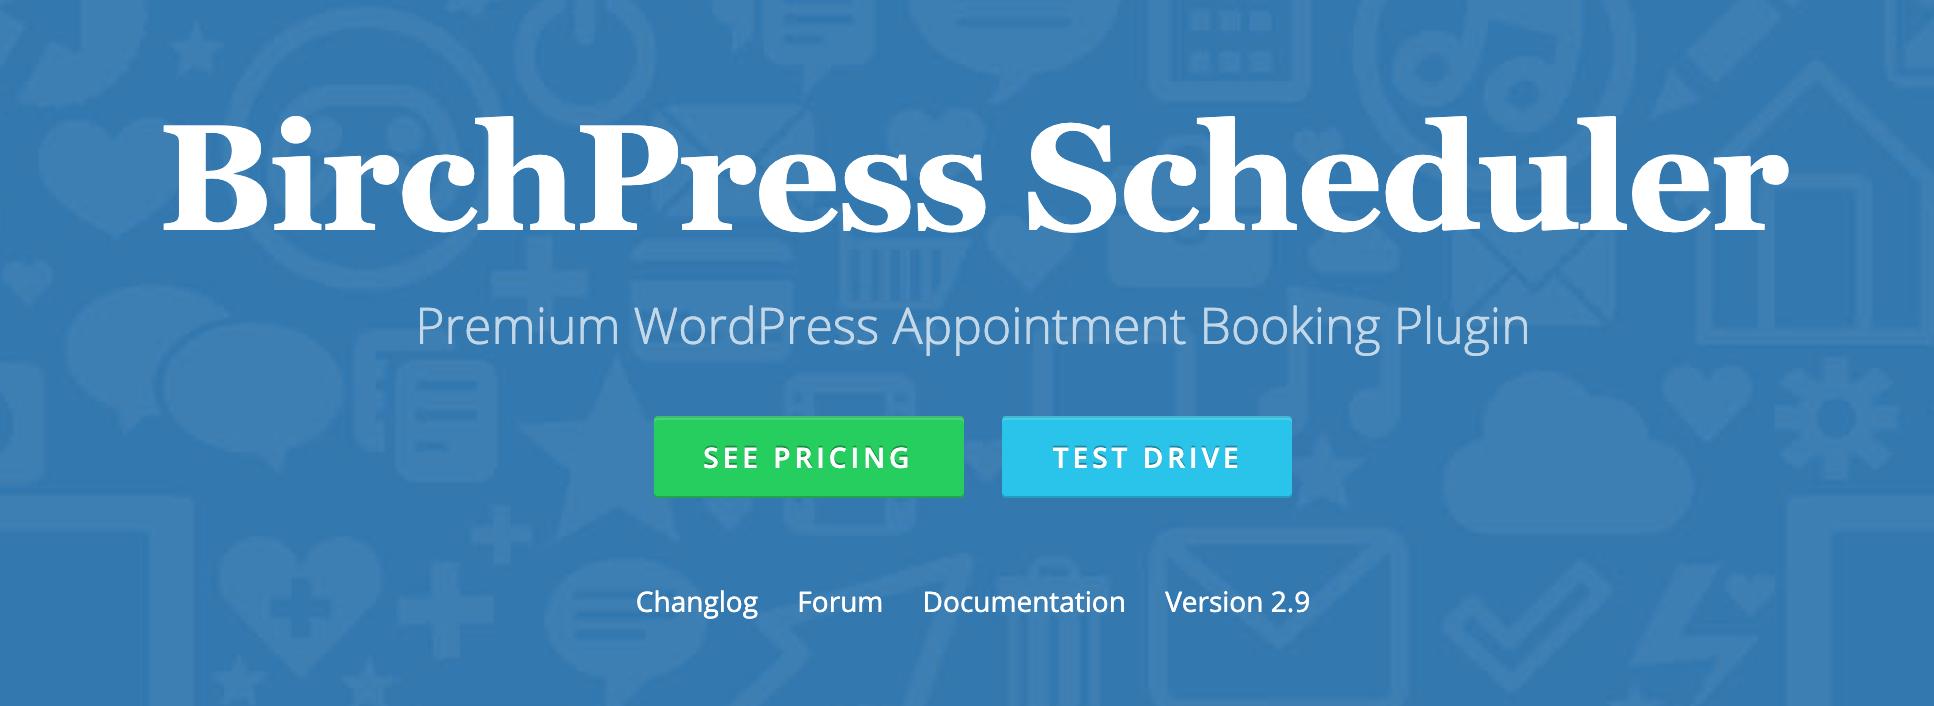 The BirchPress Scheduler plugin.